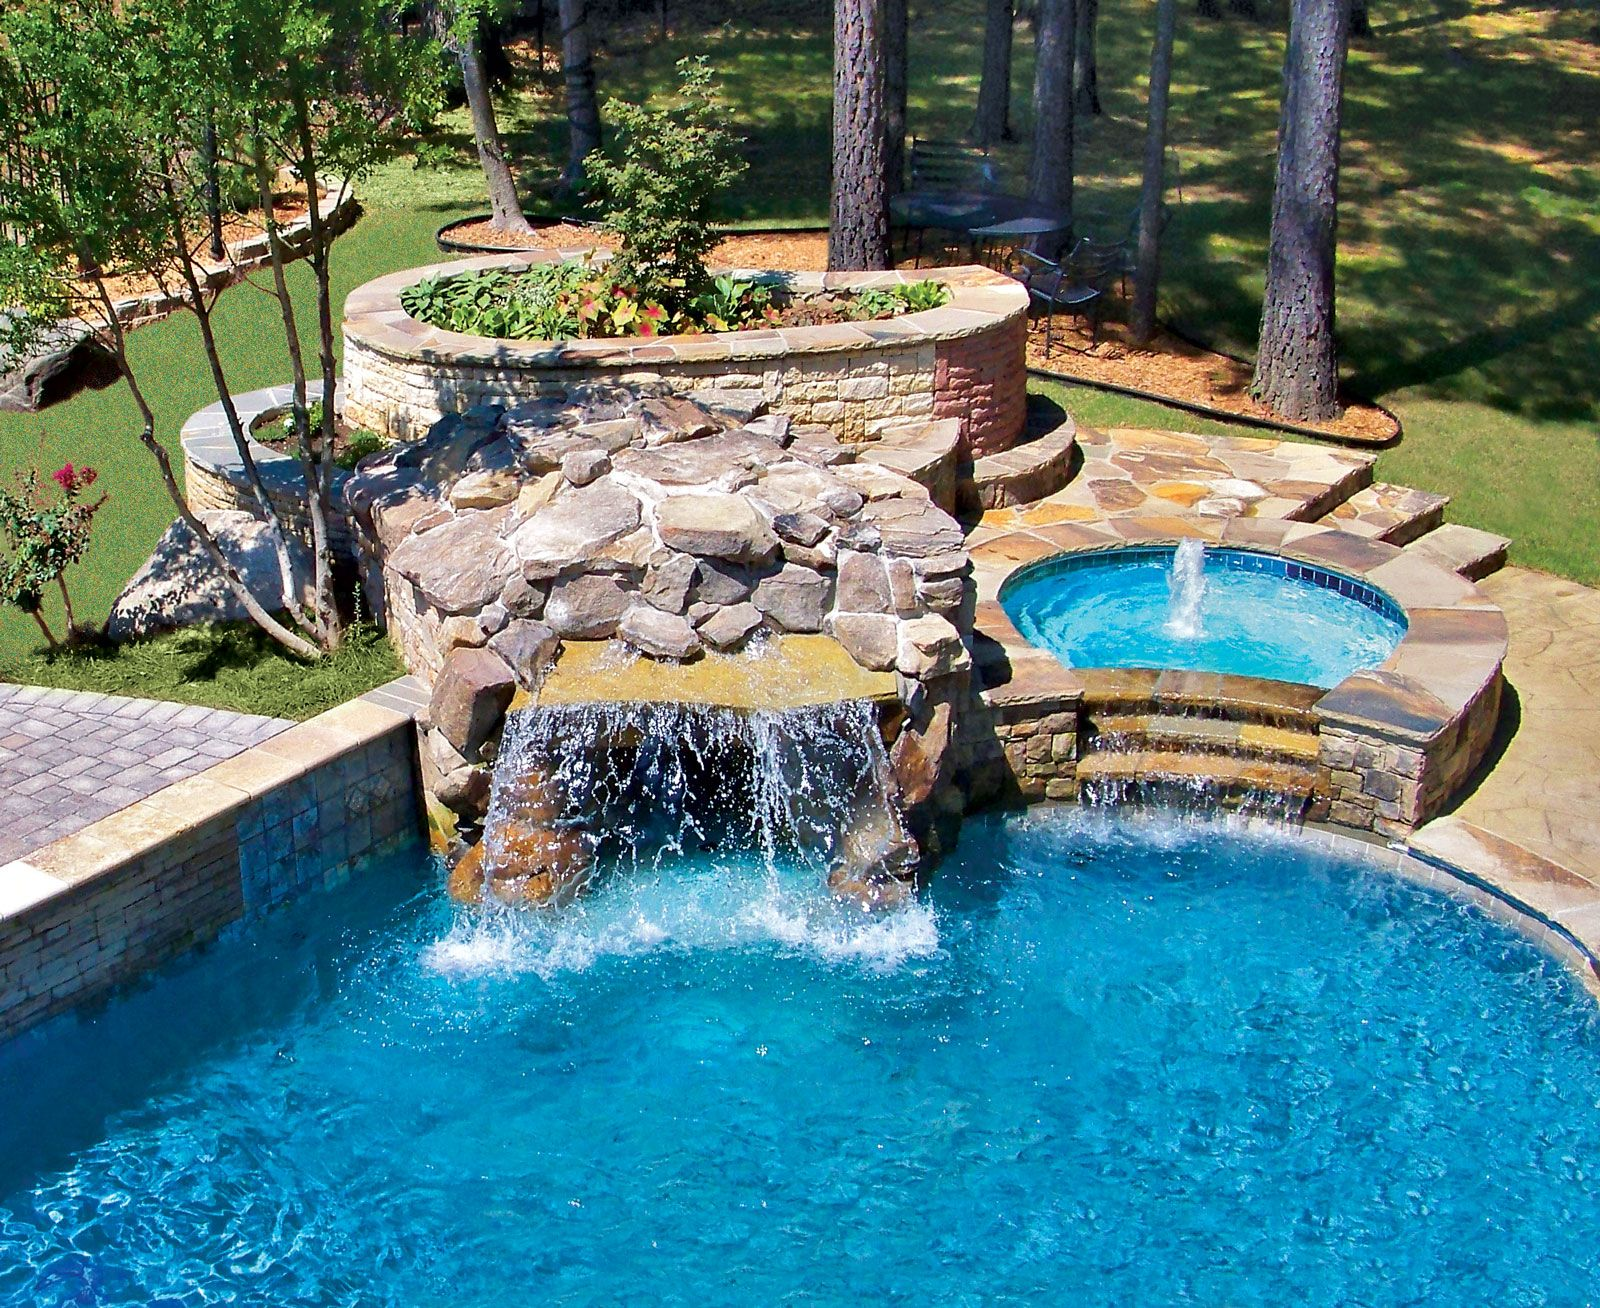 Swimming Pool Rock Waterfall Pictures Blue Haven Rock Waterfall Indoor Waterfall Pools Backyard Inground